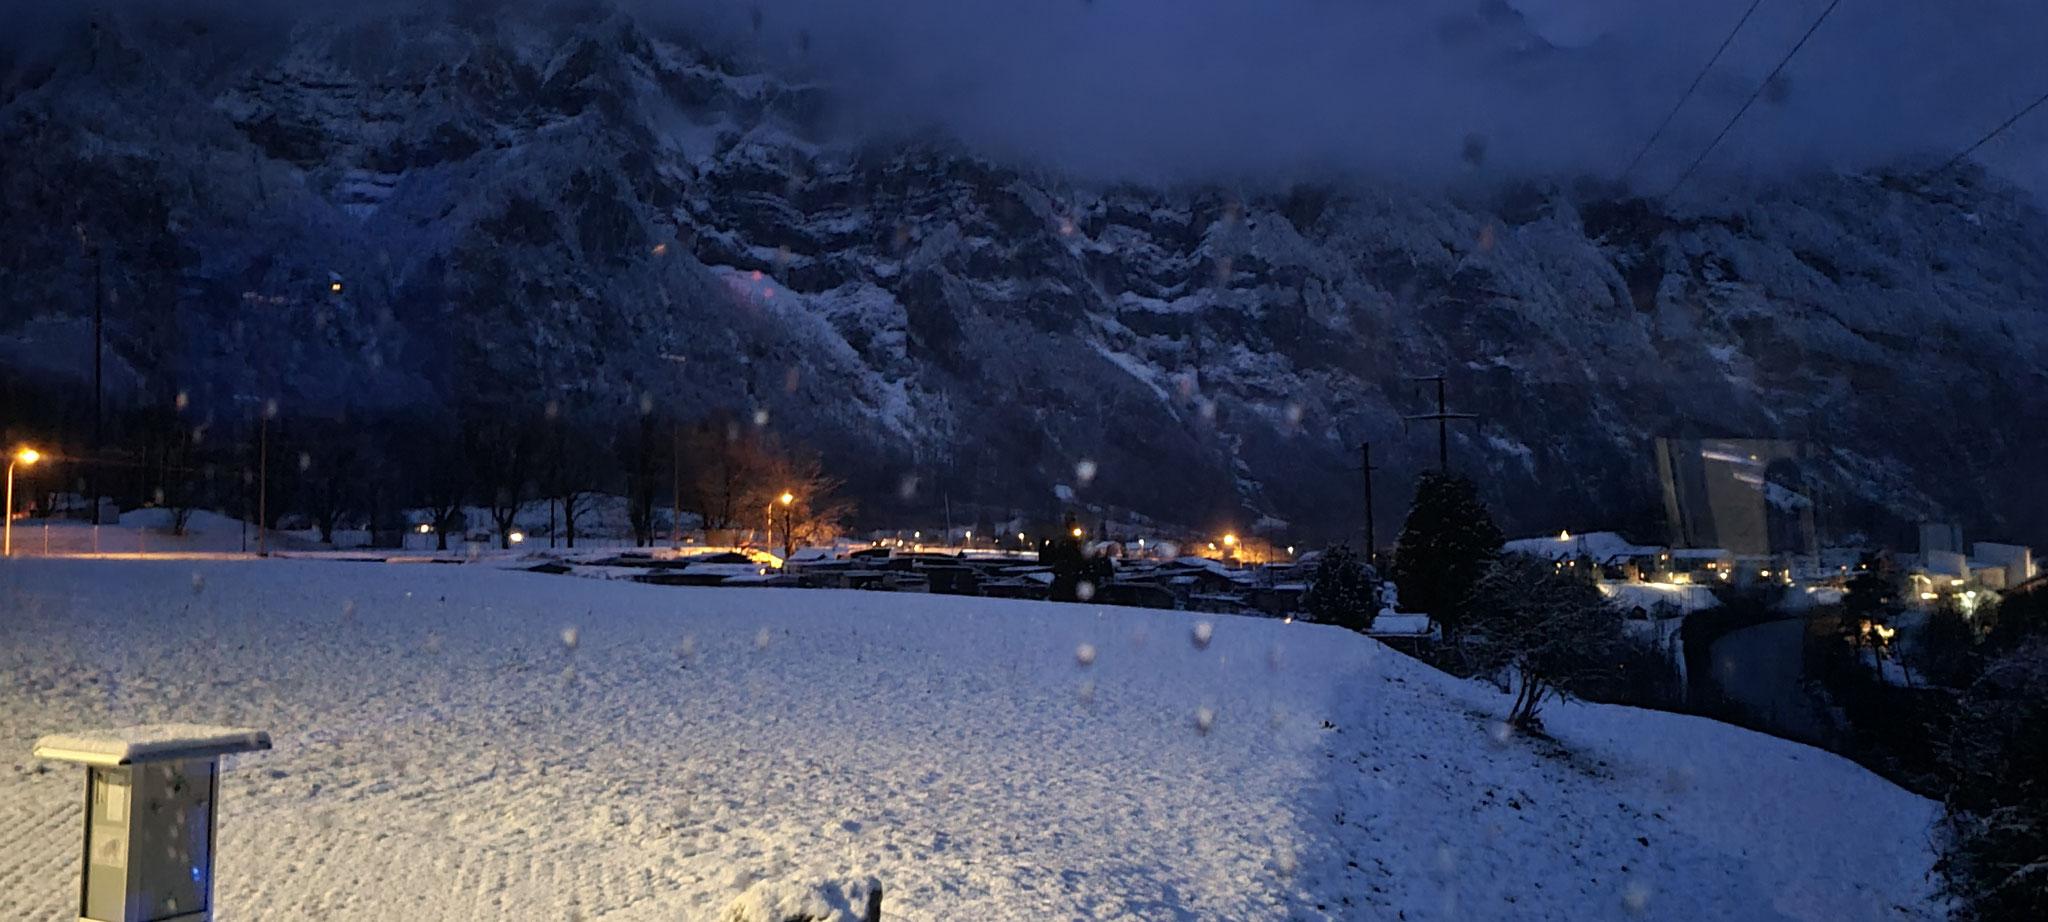 Blick ins Tal - jetzt mit Schnee